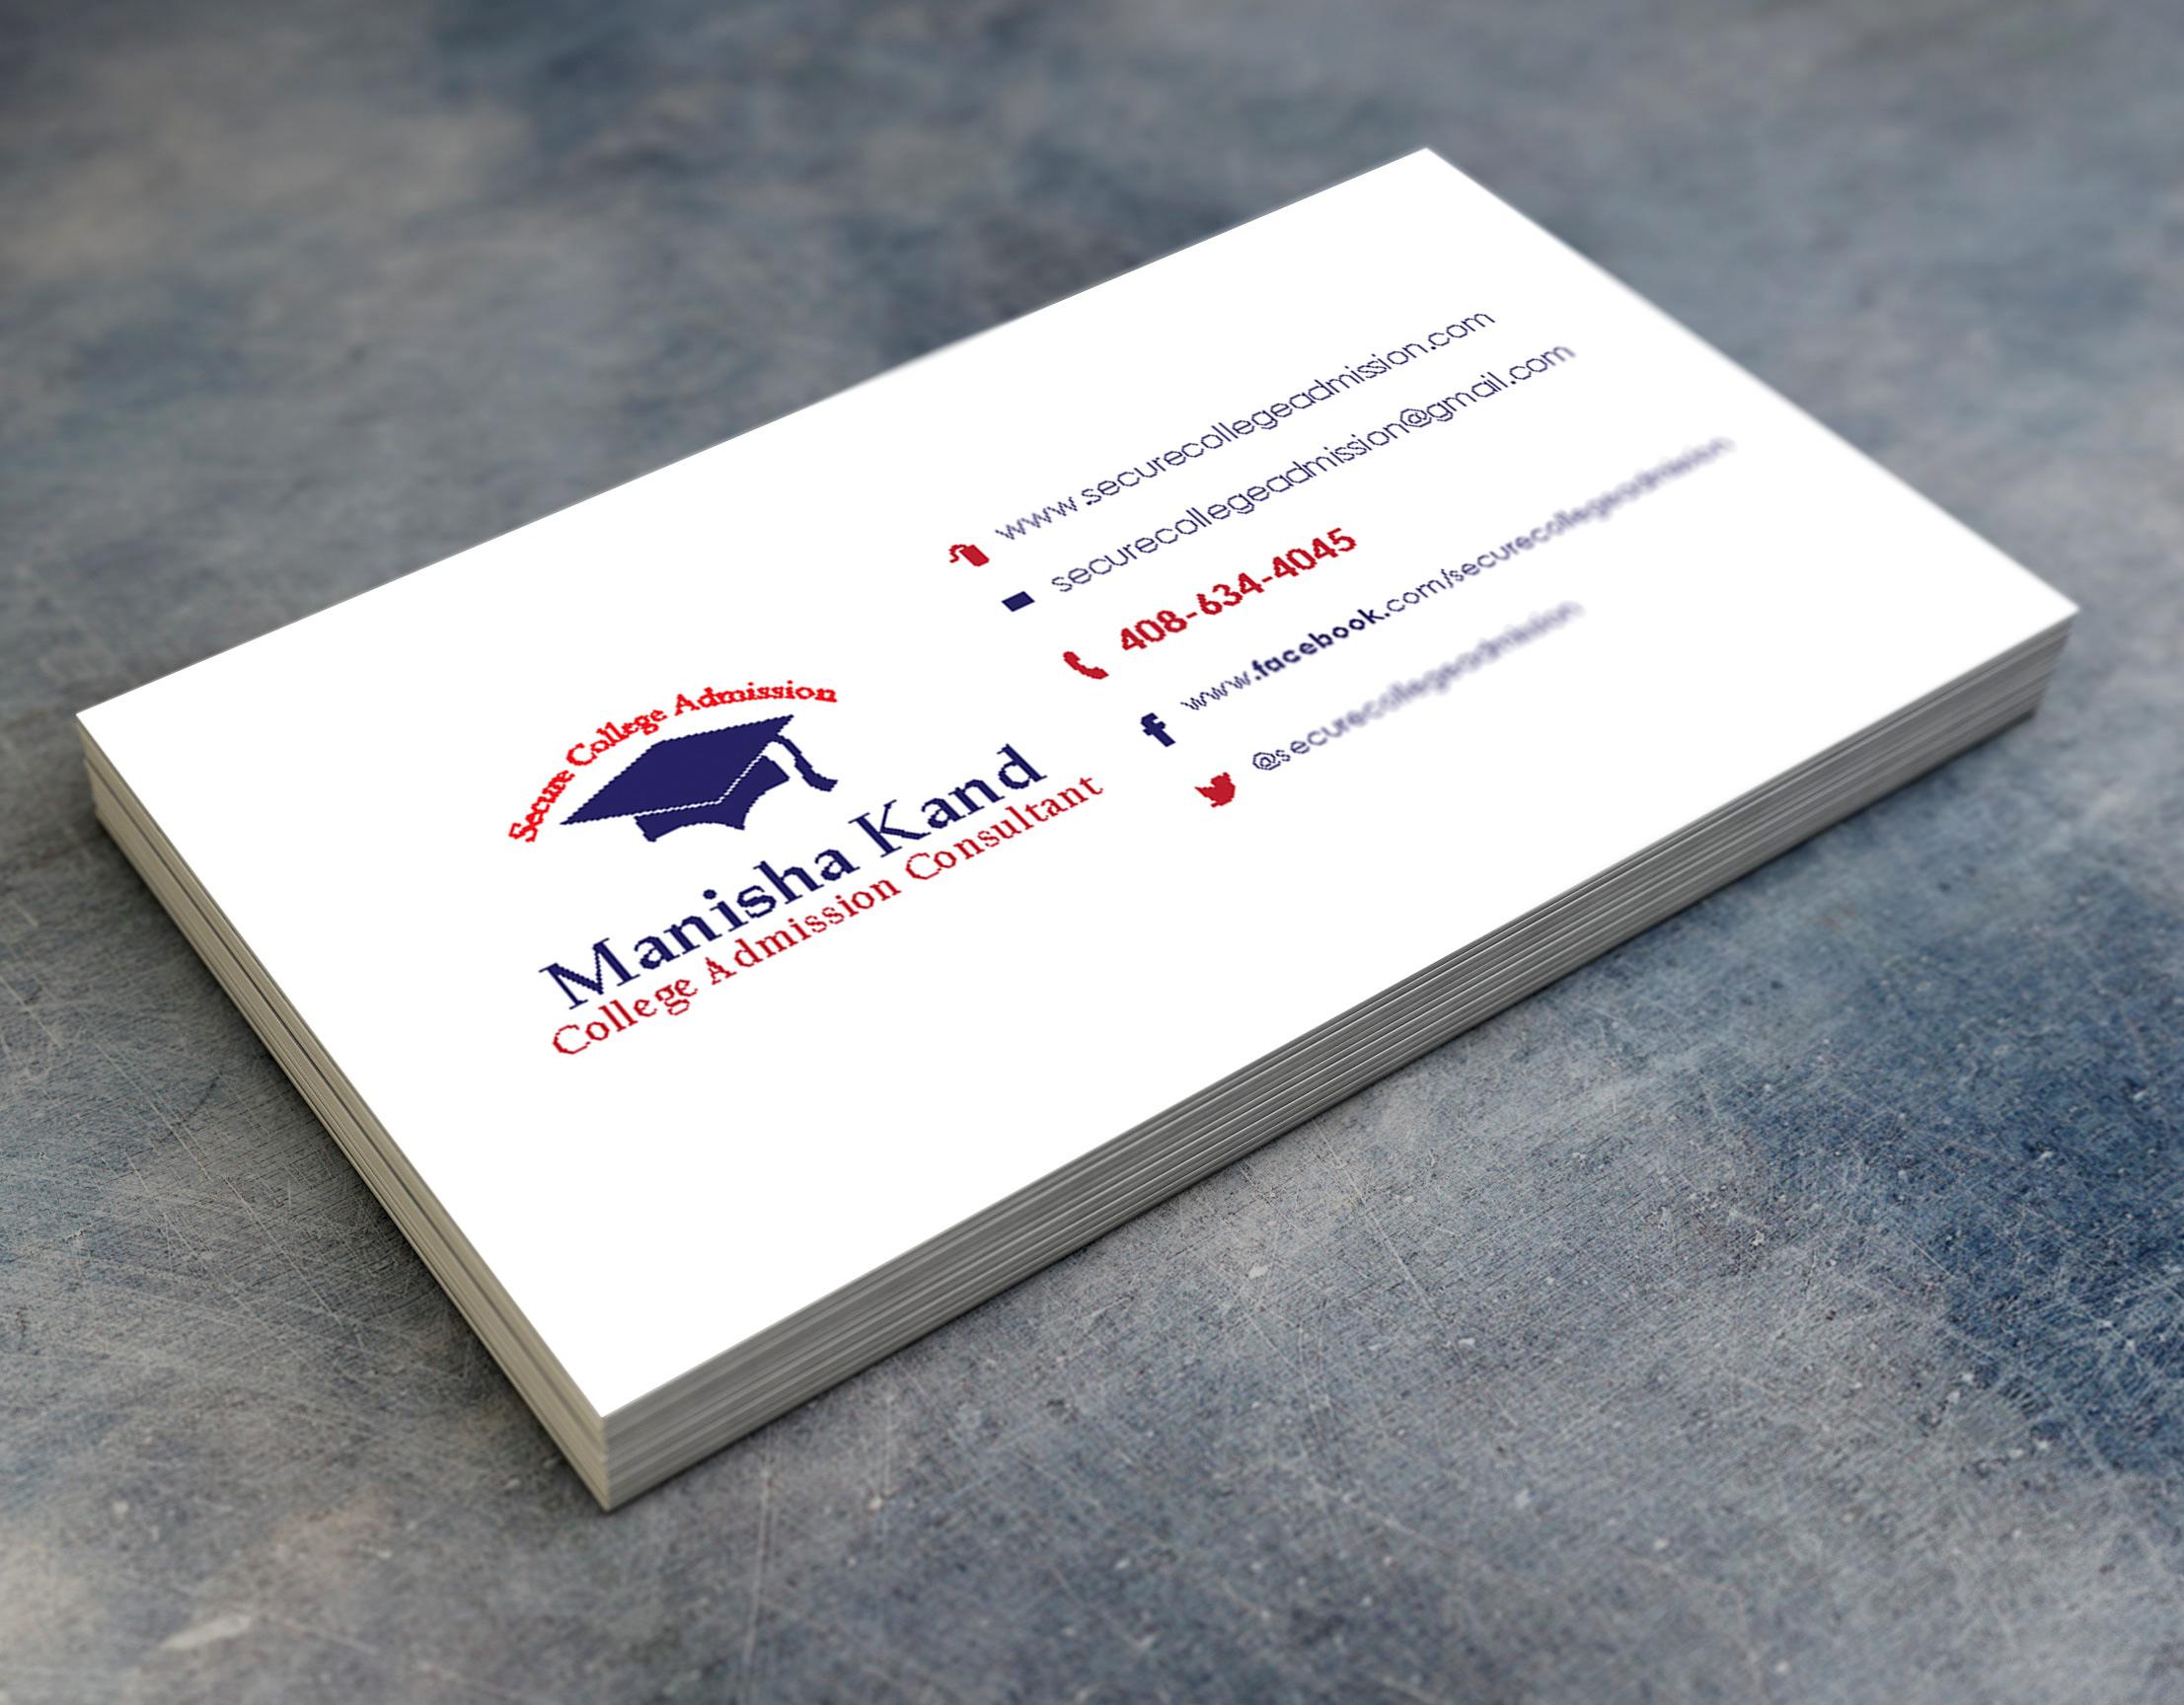 shubhangi kadhe - Logo Design and Business Card